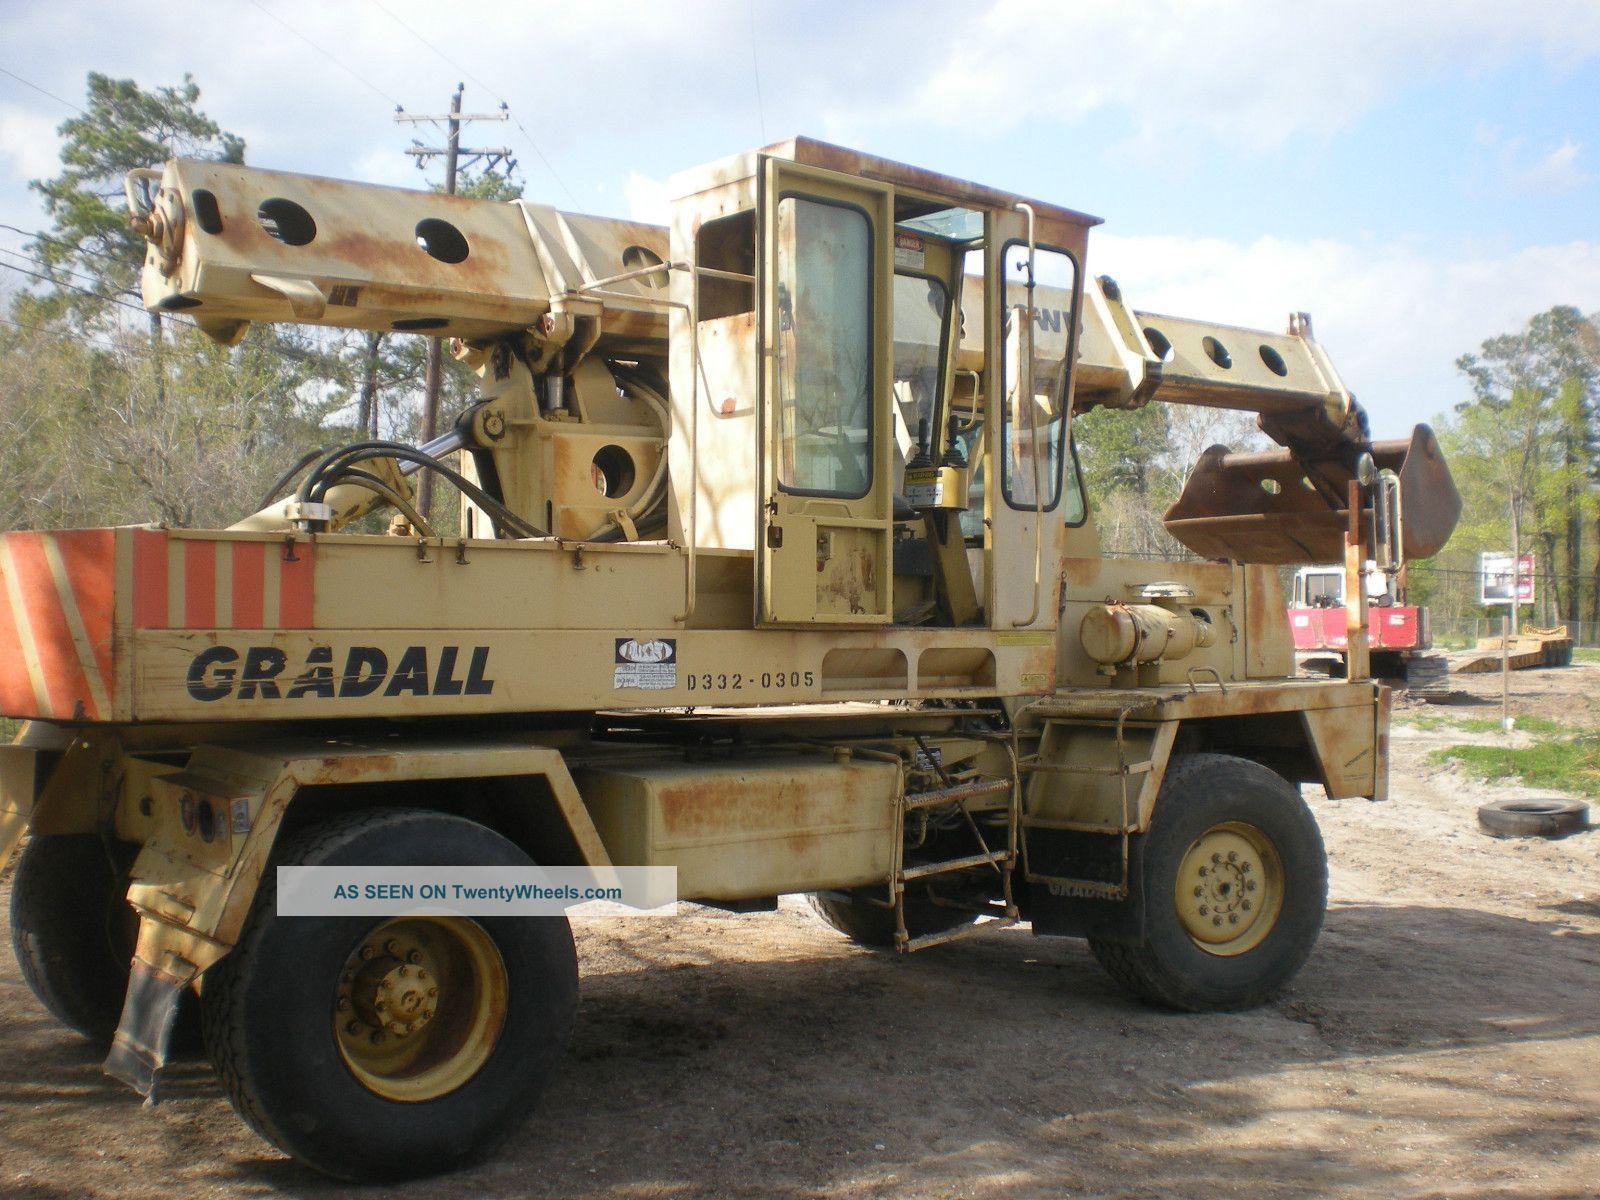 Gradall G3wd Excavator Excavators photo